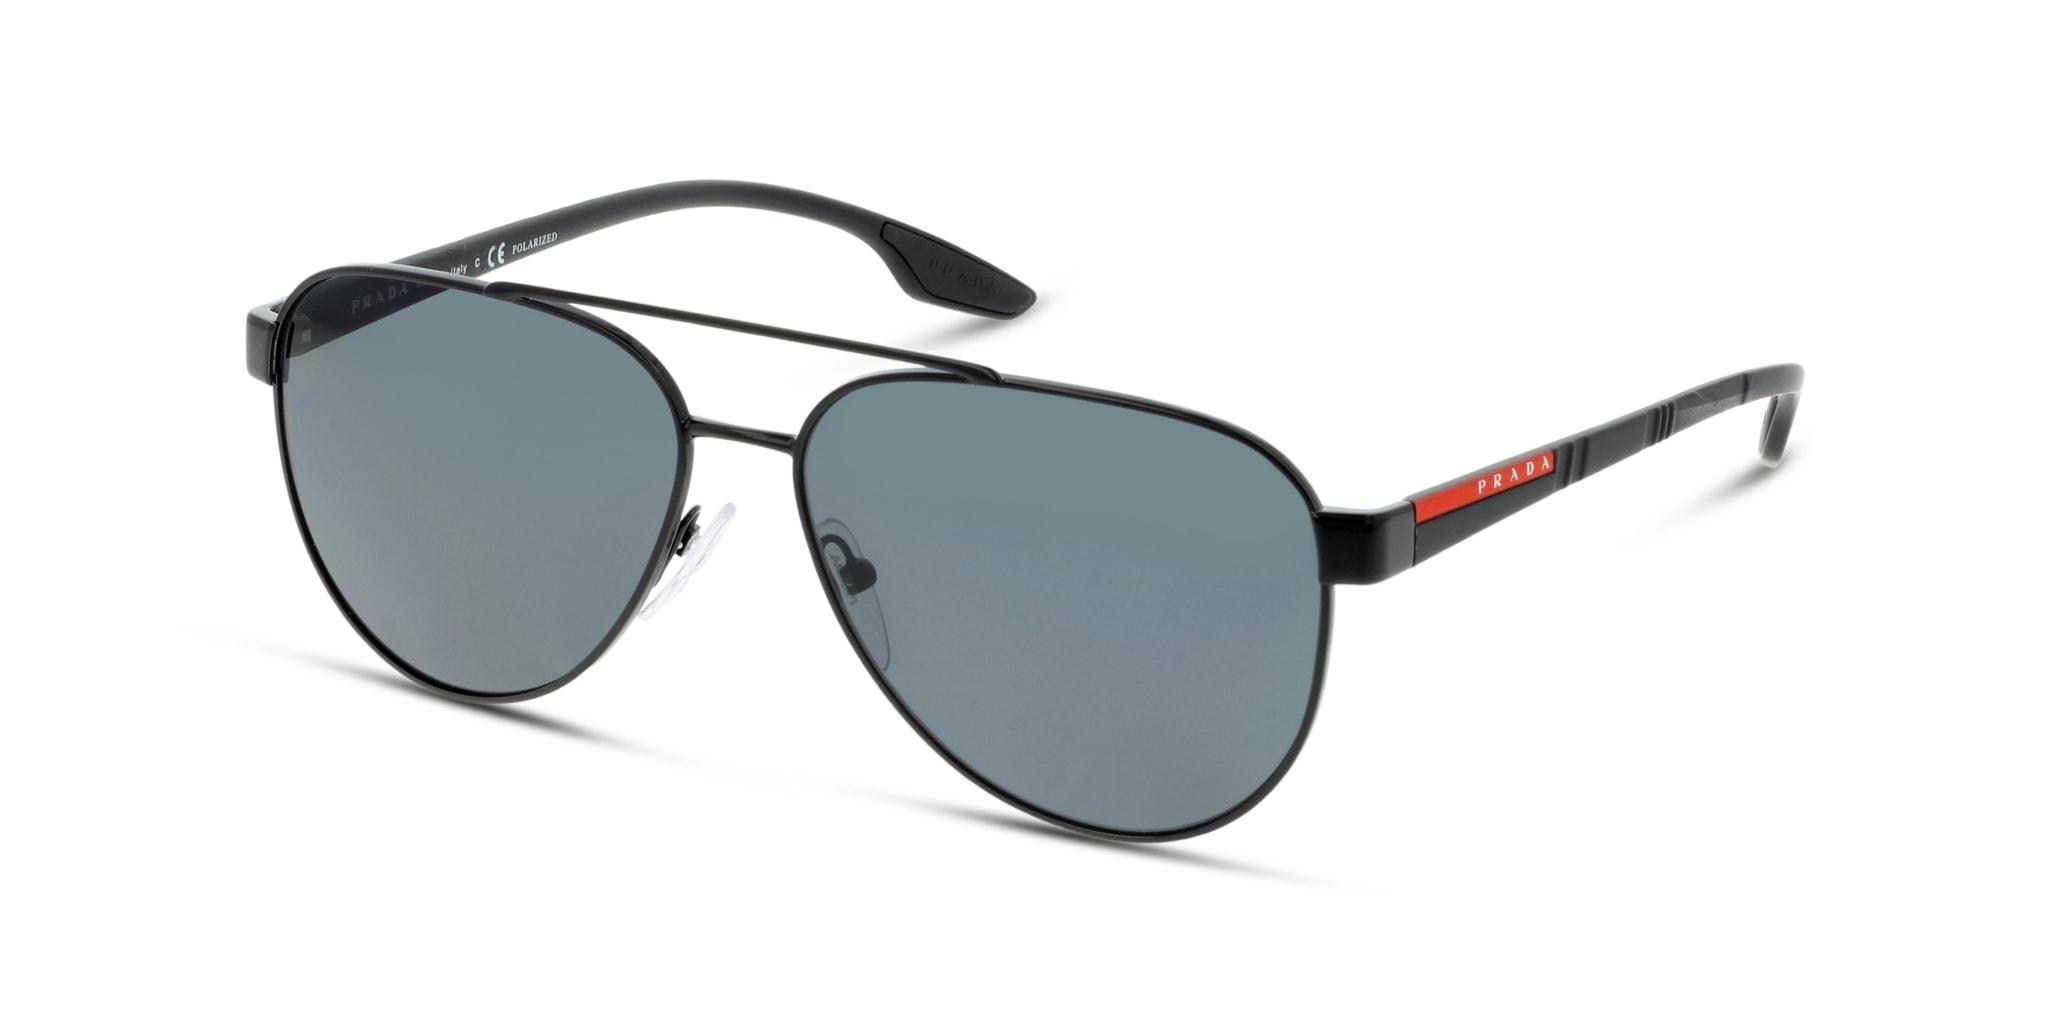 8053672922684-angle-01-prada-ps54ts-eyewear-black